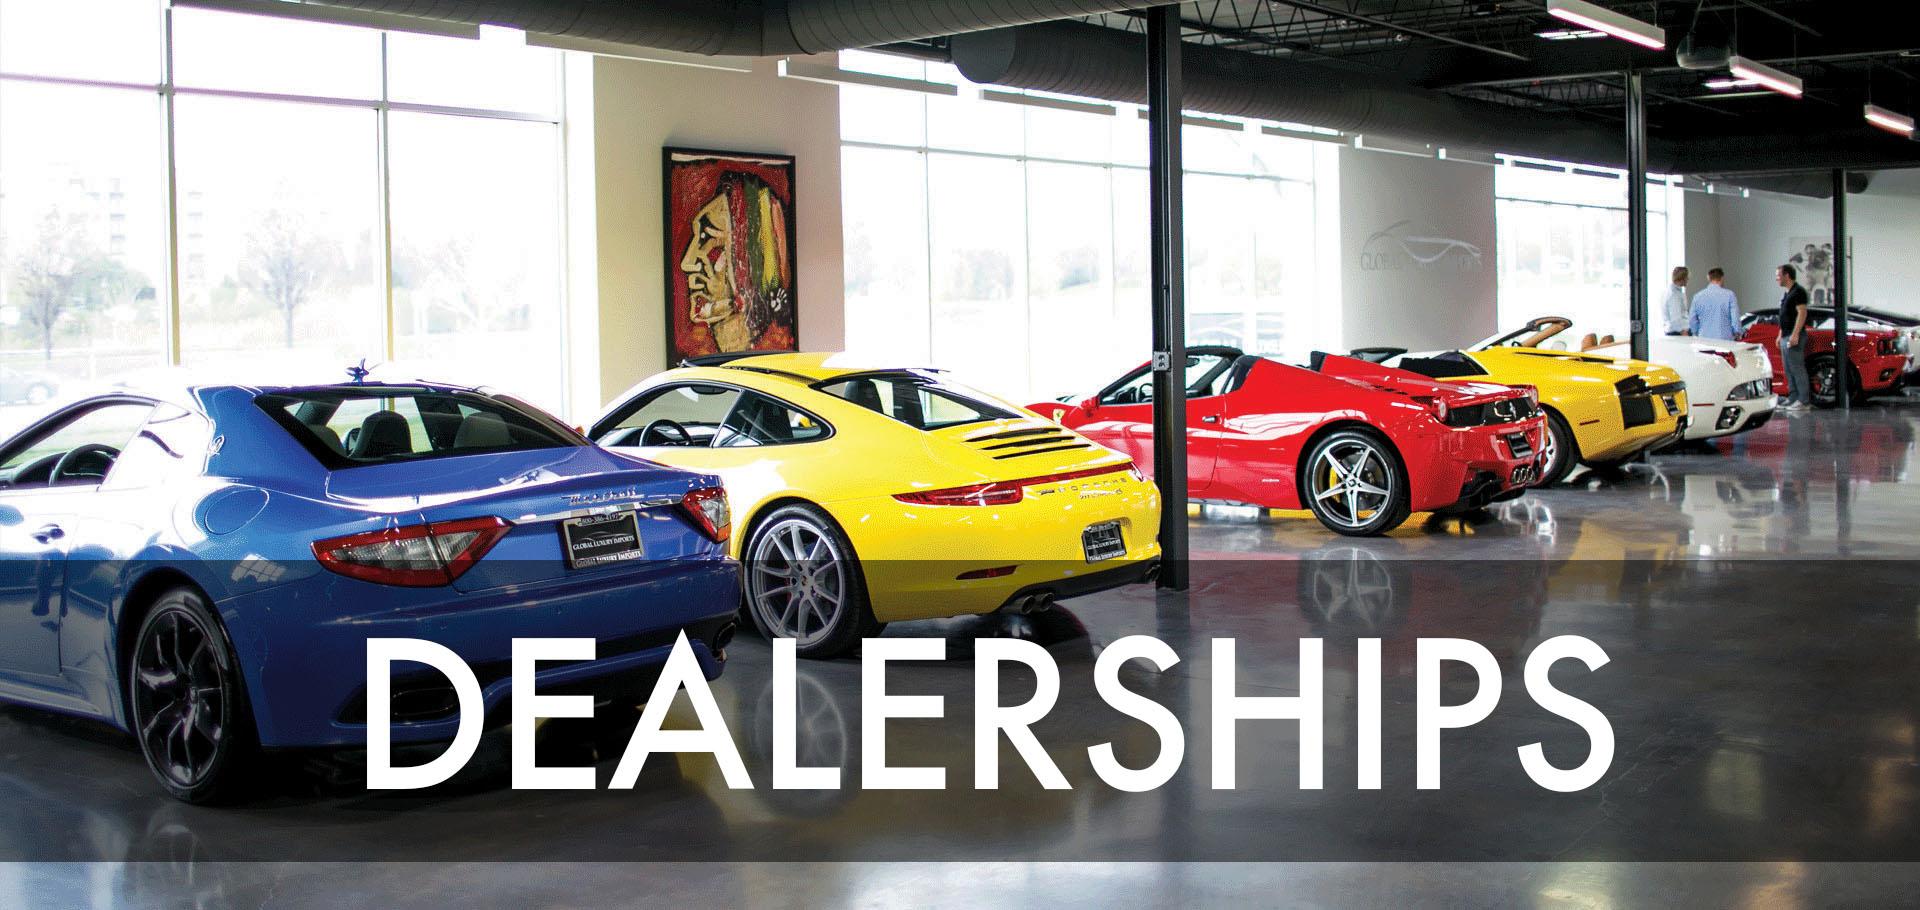 dealerships.jpg